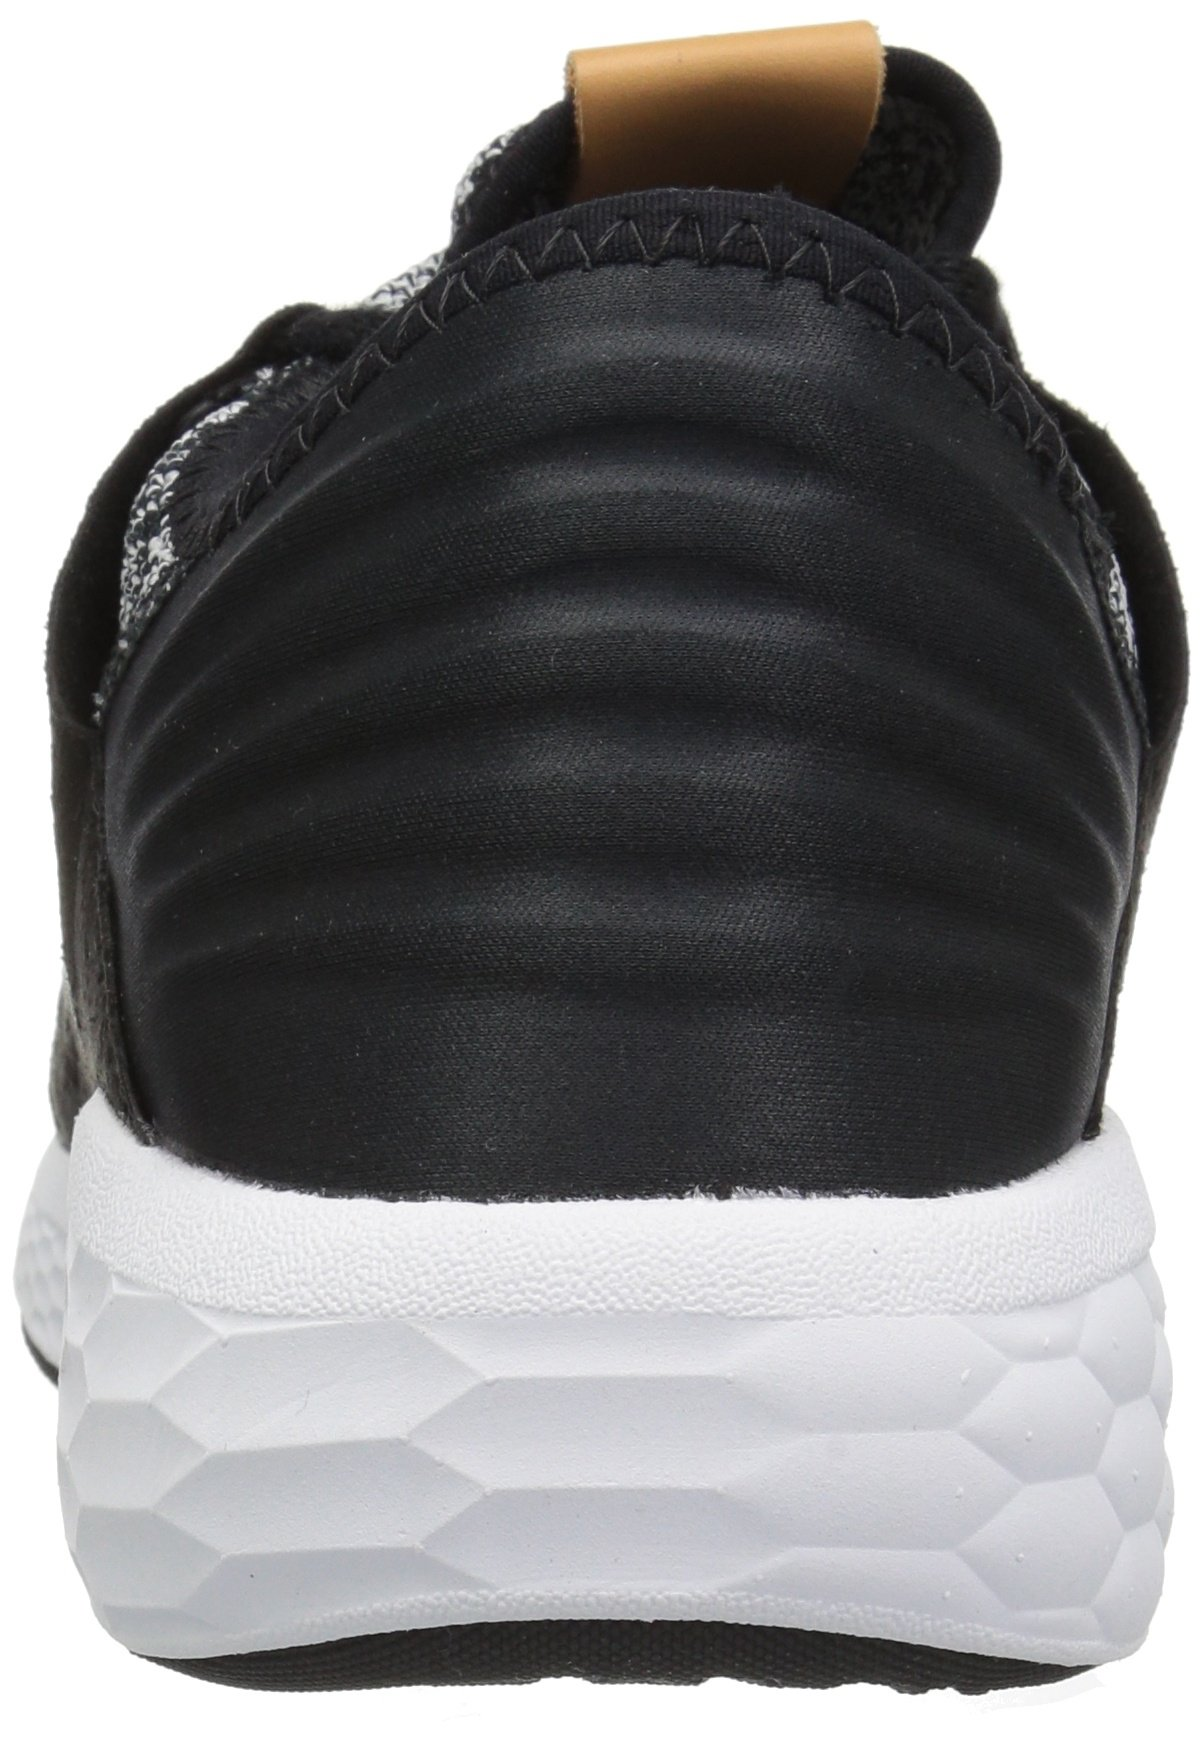 New Balance Men's Cruz V2 Fresh Foam Running Shoe, white/black, 7 D US by New Balance (Image #2)